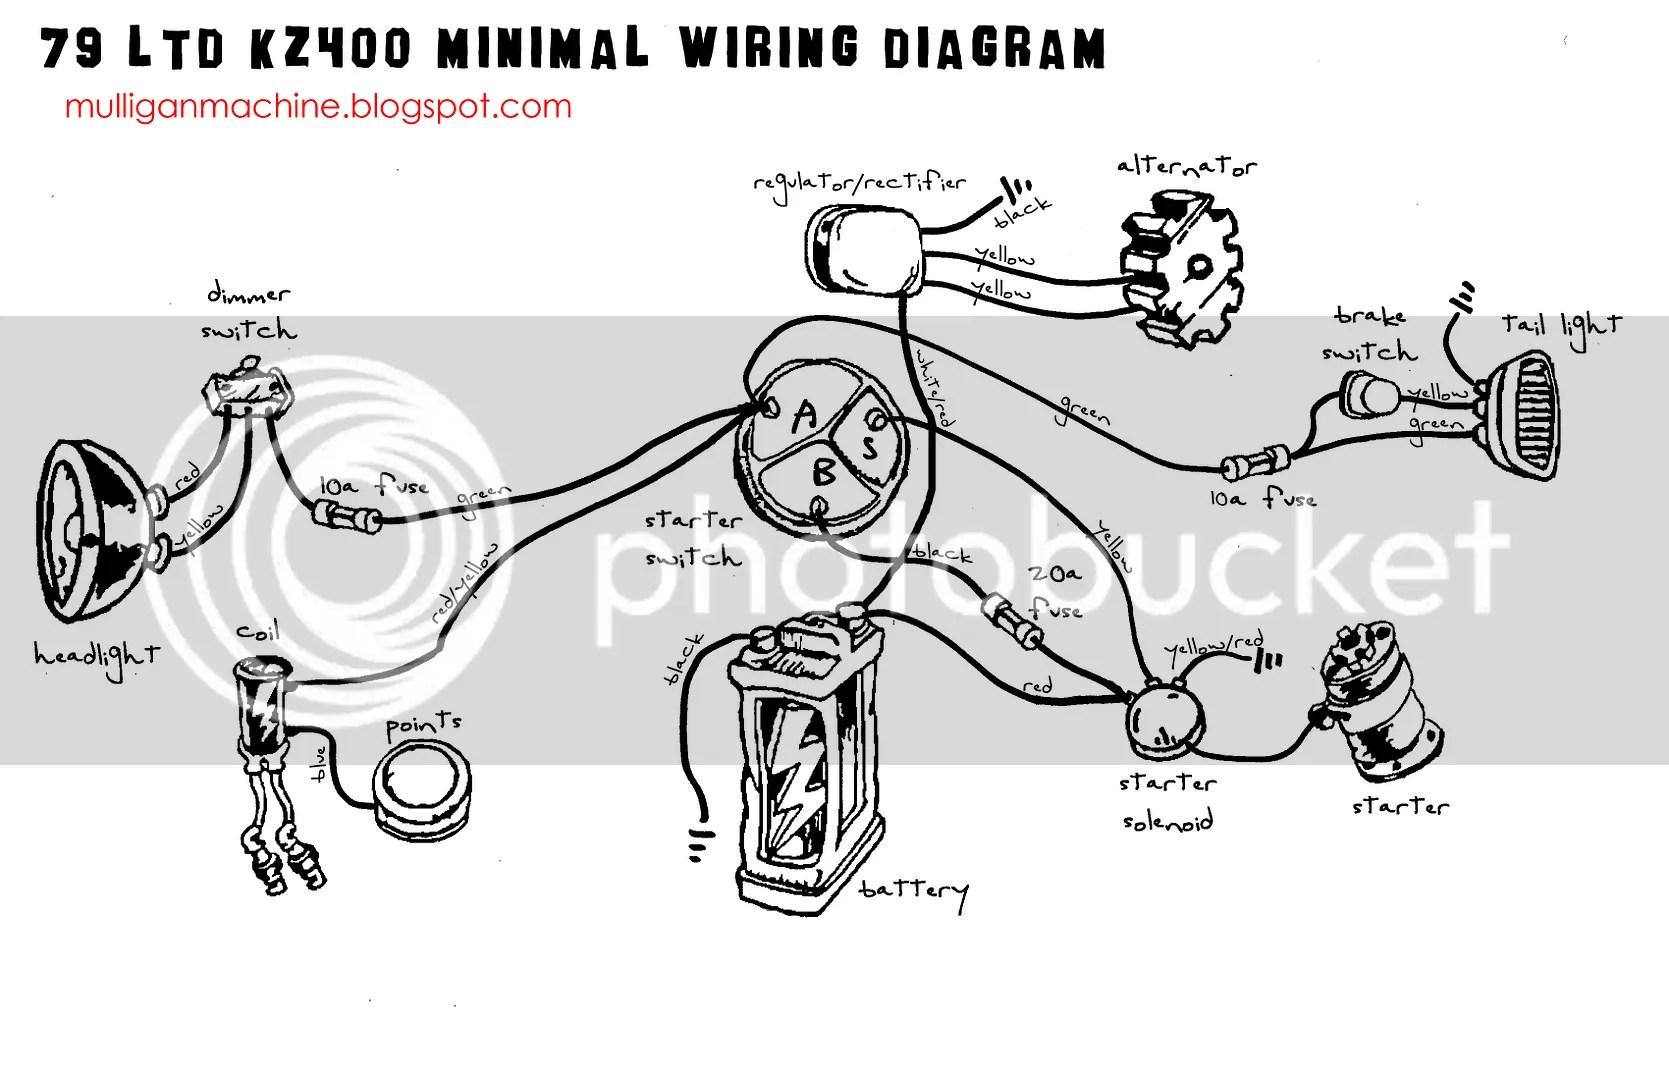 hight resolution of kz400 minimal wiring diagram wiring diagram newkz400 wiring diagram wiring diagram load kz400 minimal wiring diagram